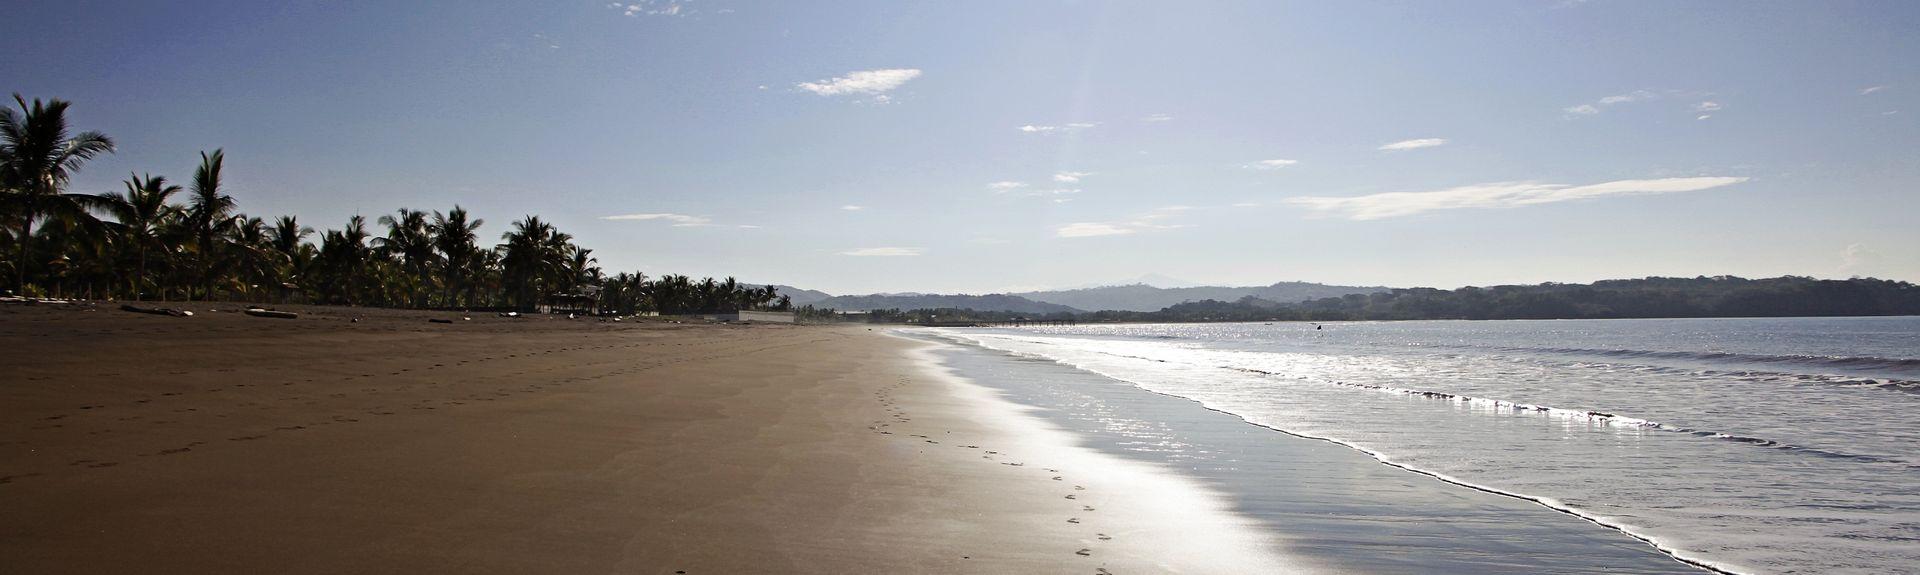 Barranca, Puntarenas (Provinz), Costa Rica